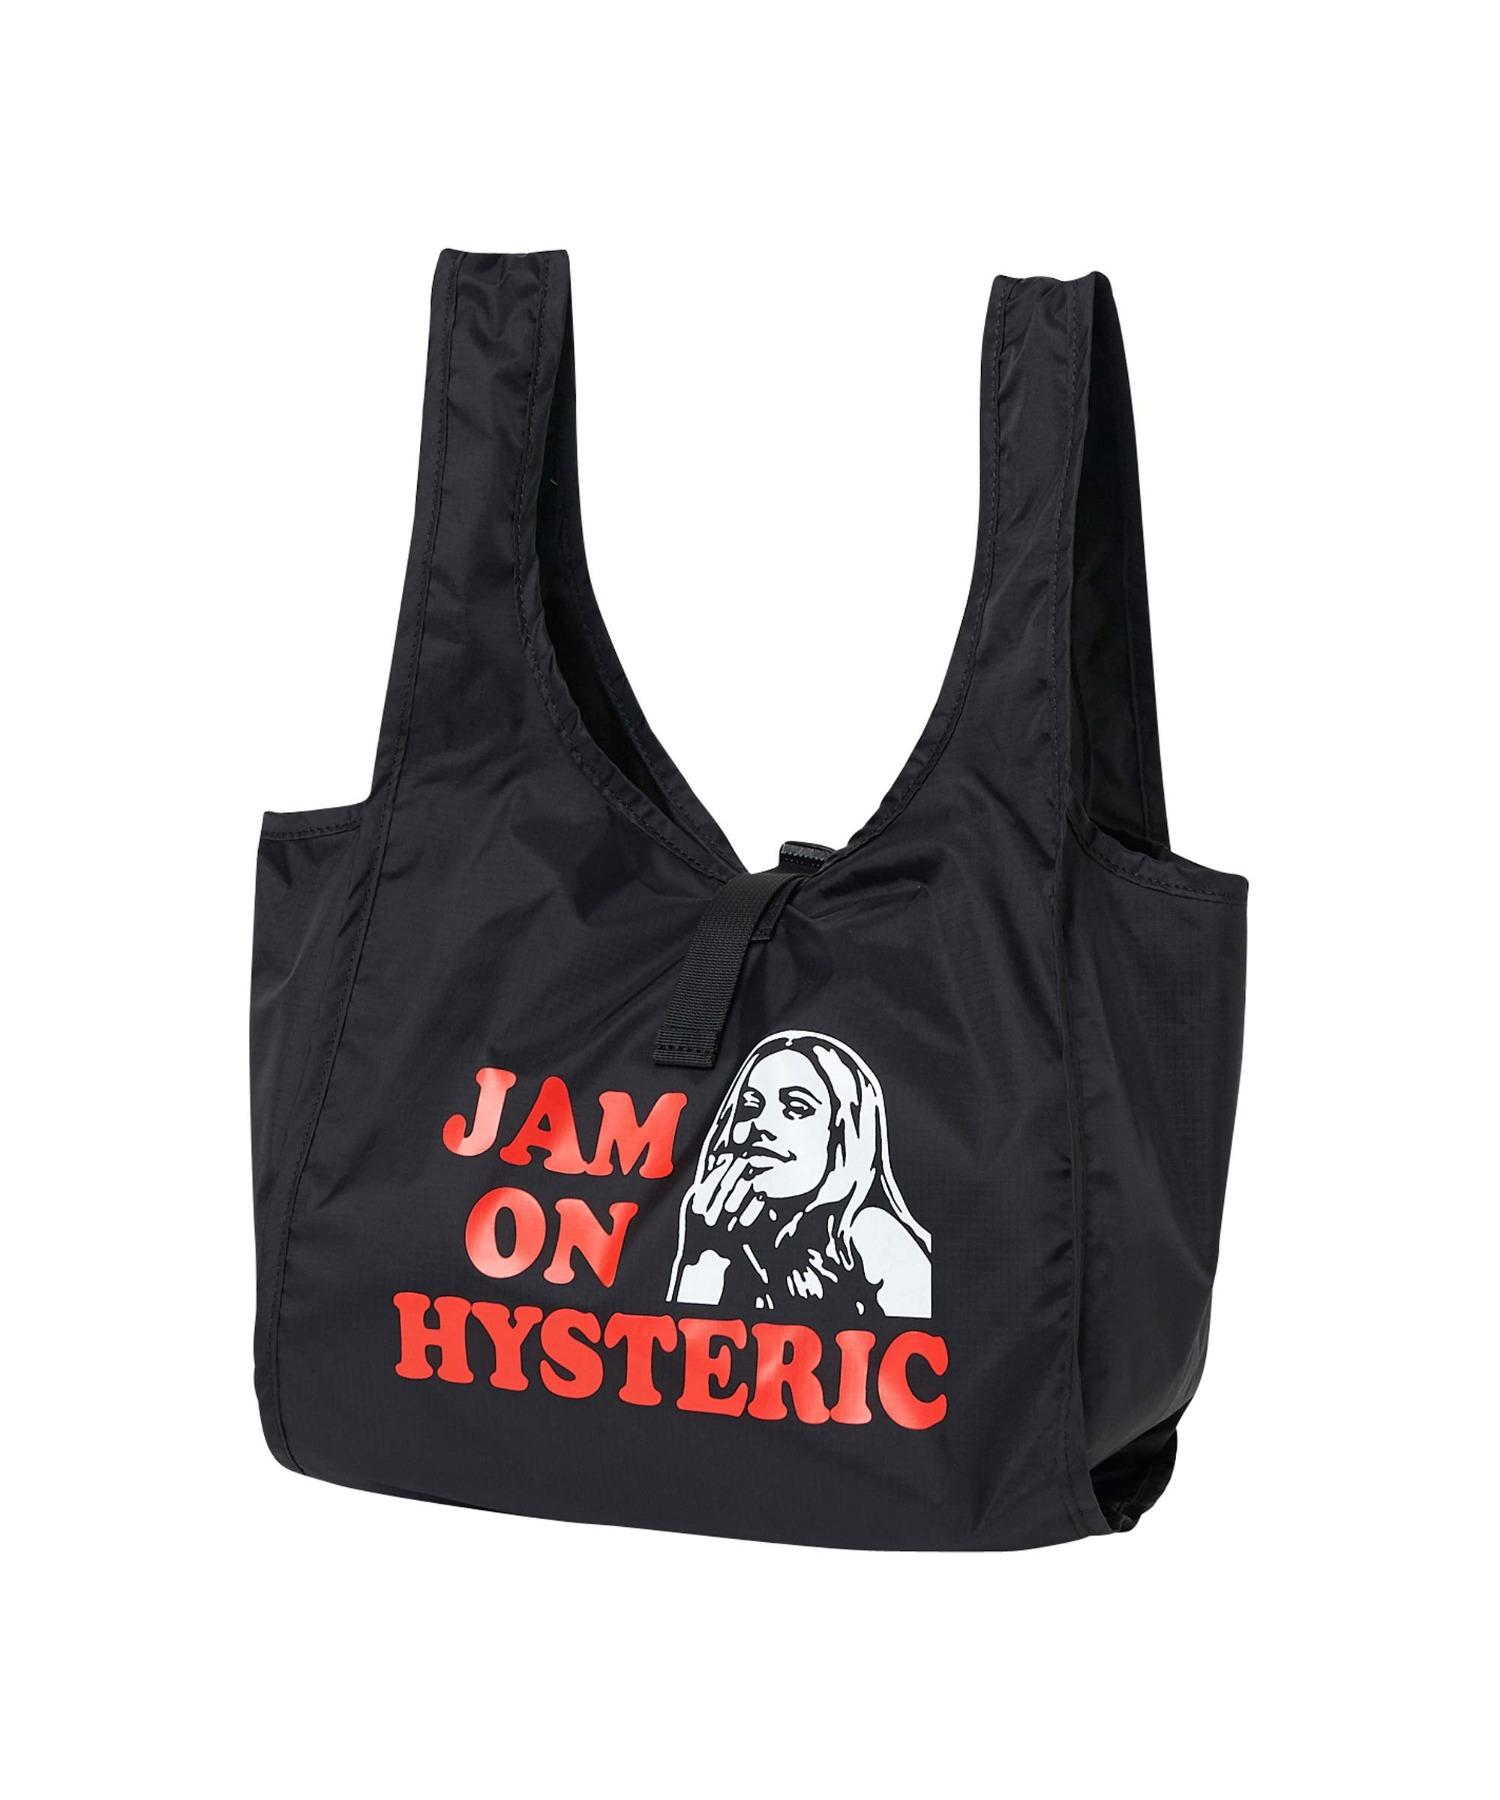 JAM ON HYSTERIC ミニエコバッグ